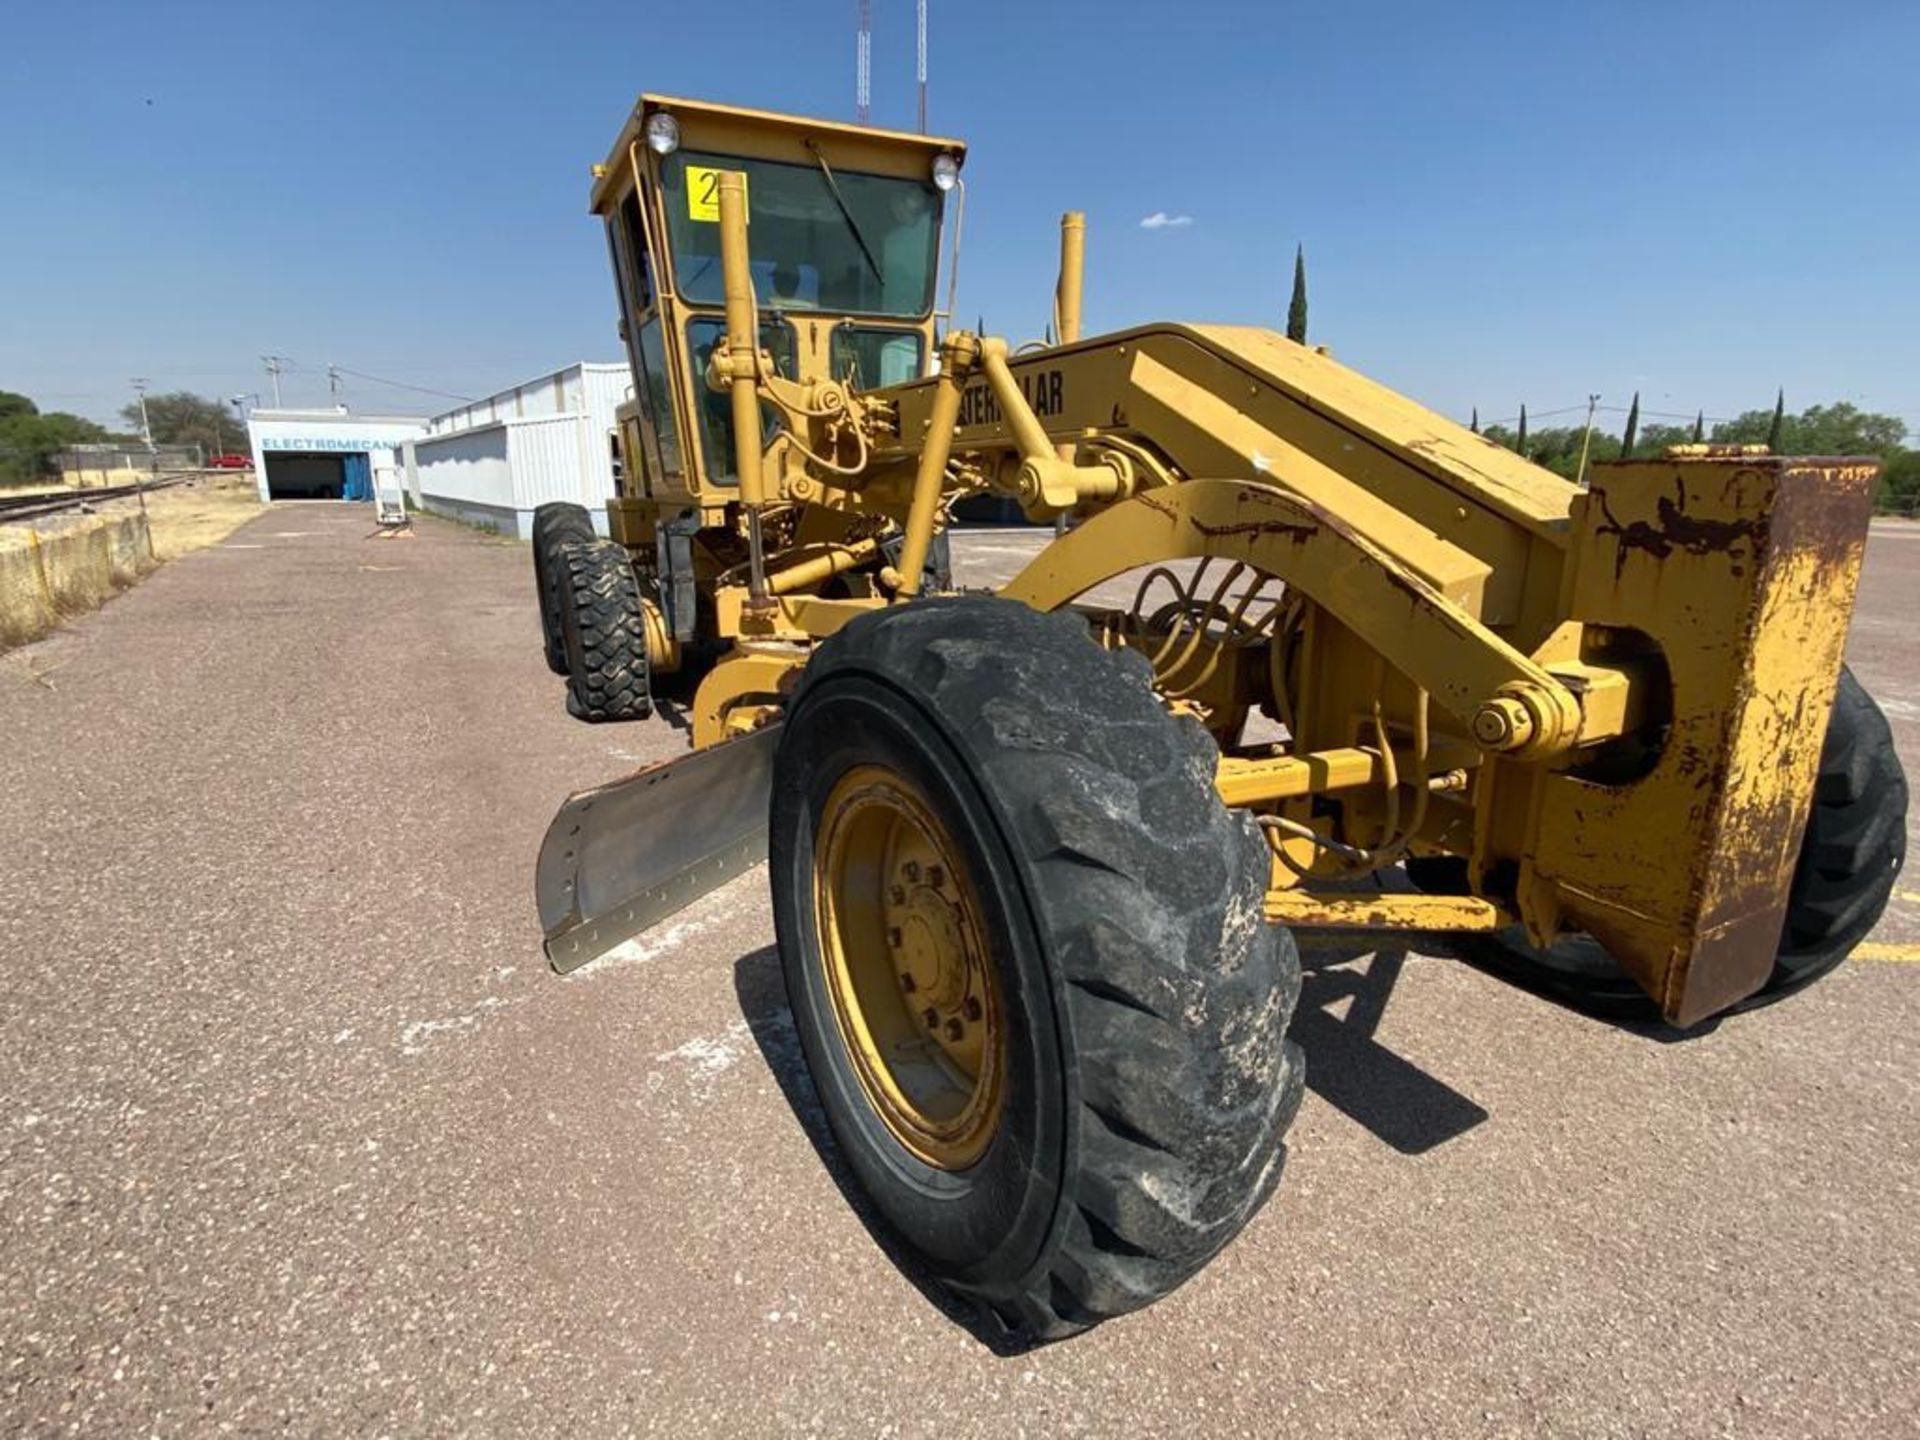 Caterpillar 120G Motor Grader, Serial number 87V09646, Motor number PQ883-2/07Z28983 - Image 25 of 61